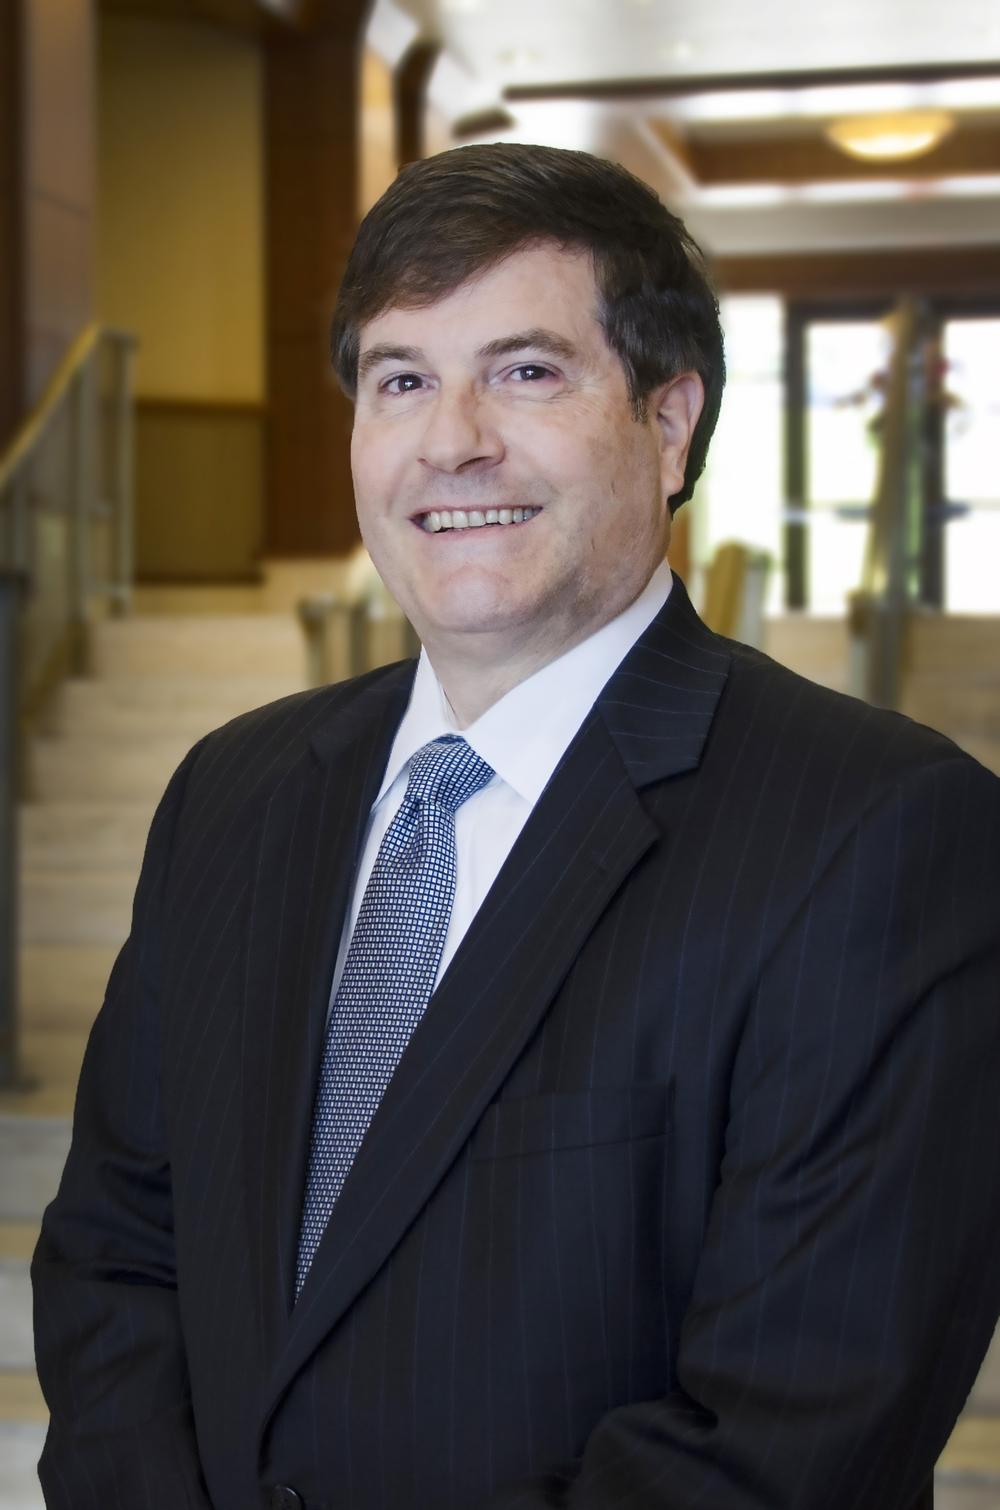 Charles F. Groves, III, CPA, CGMA